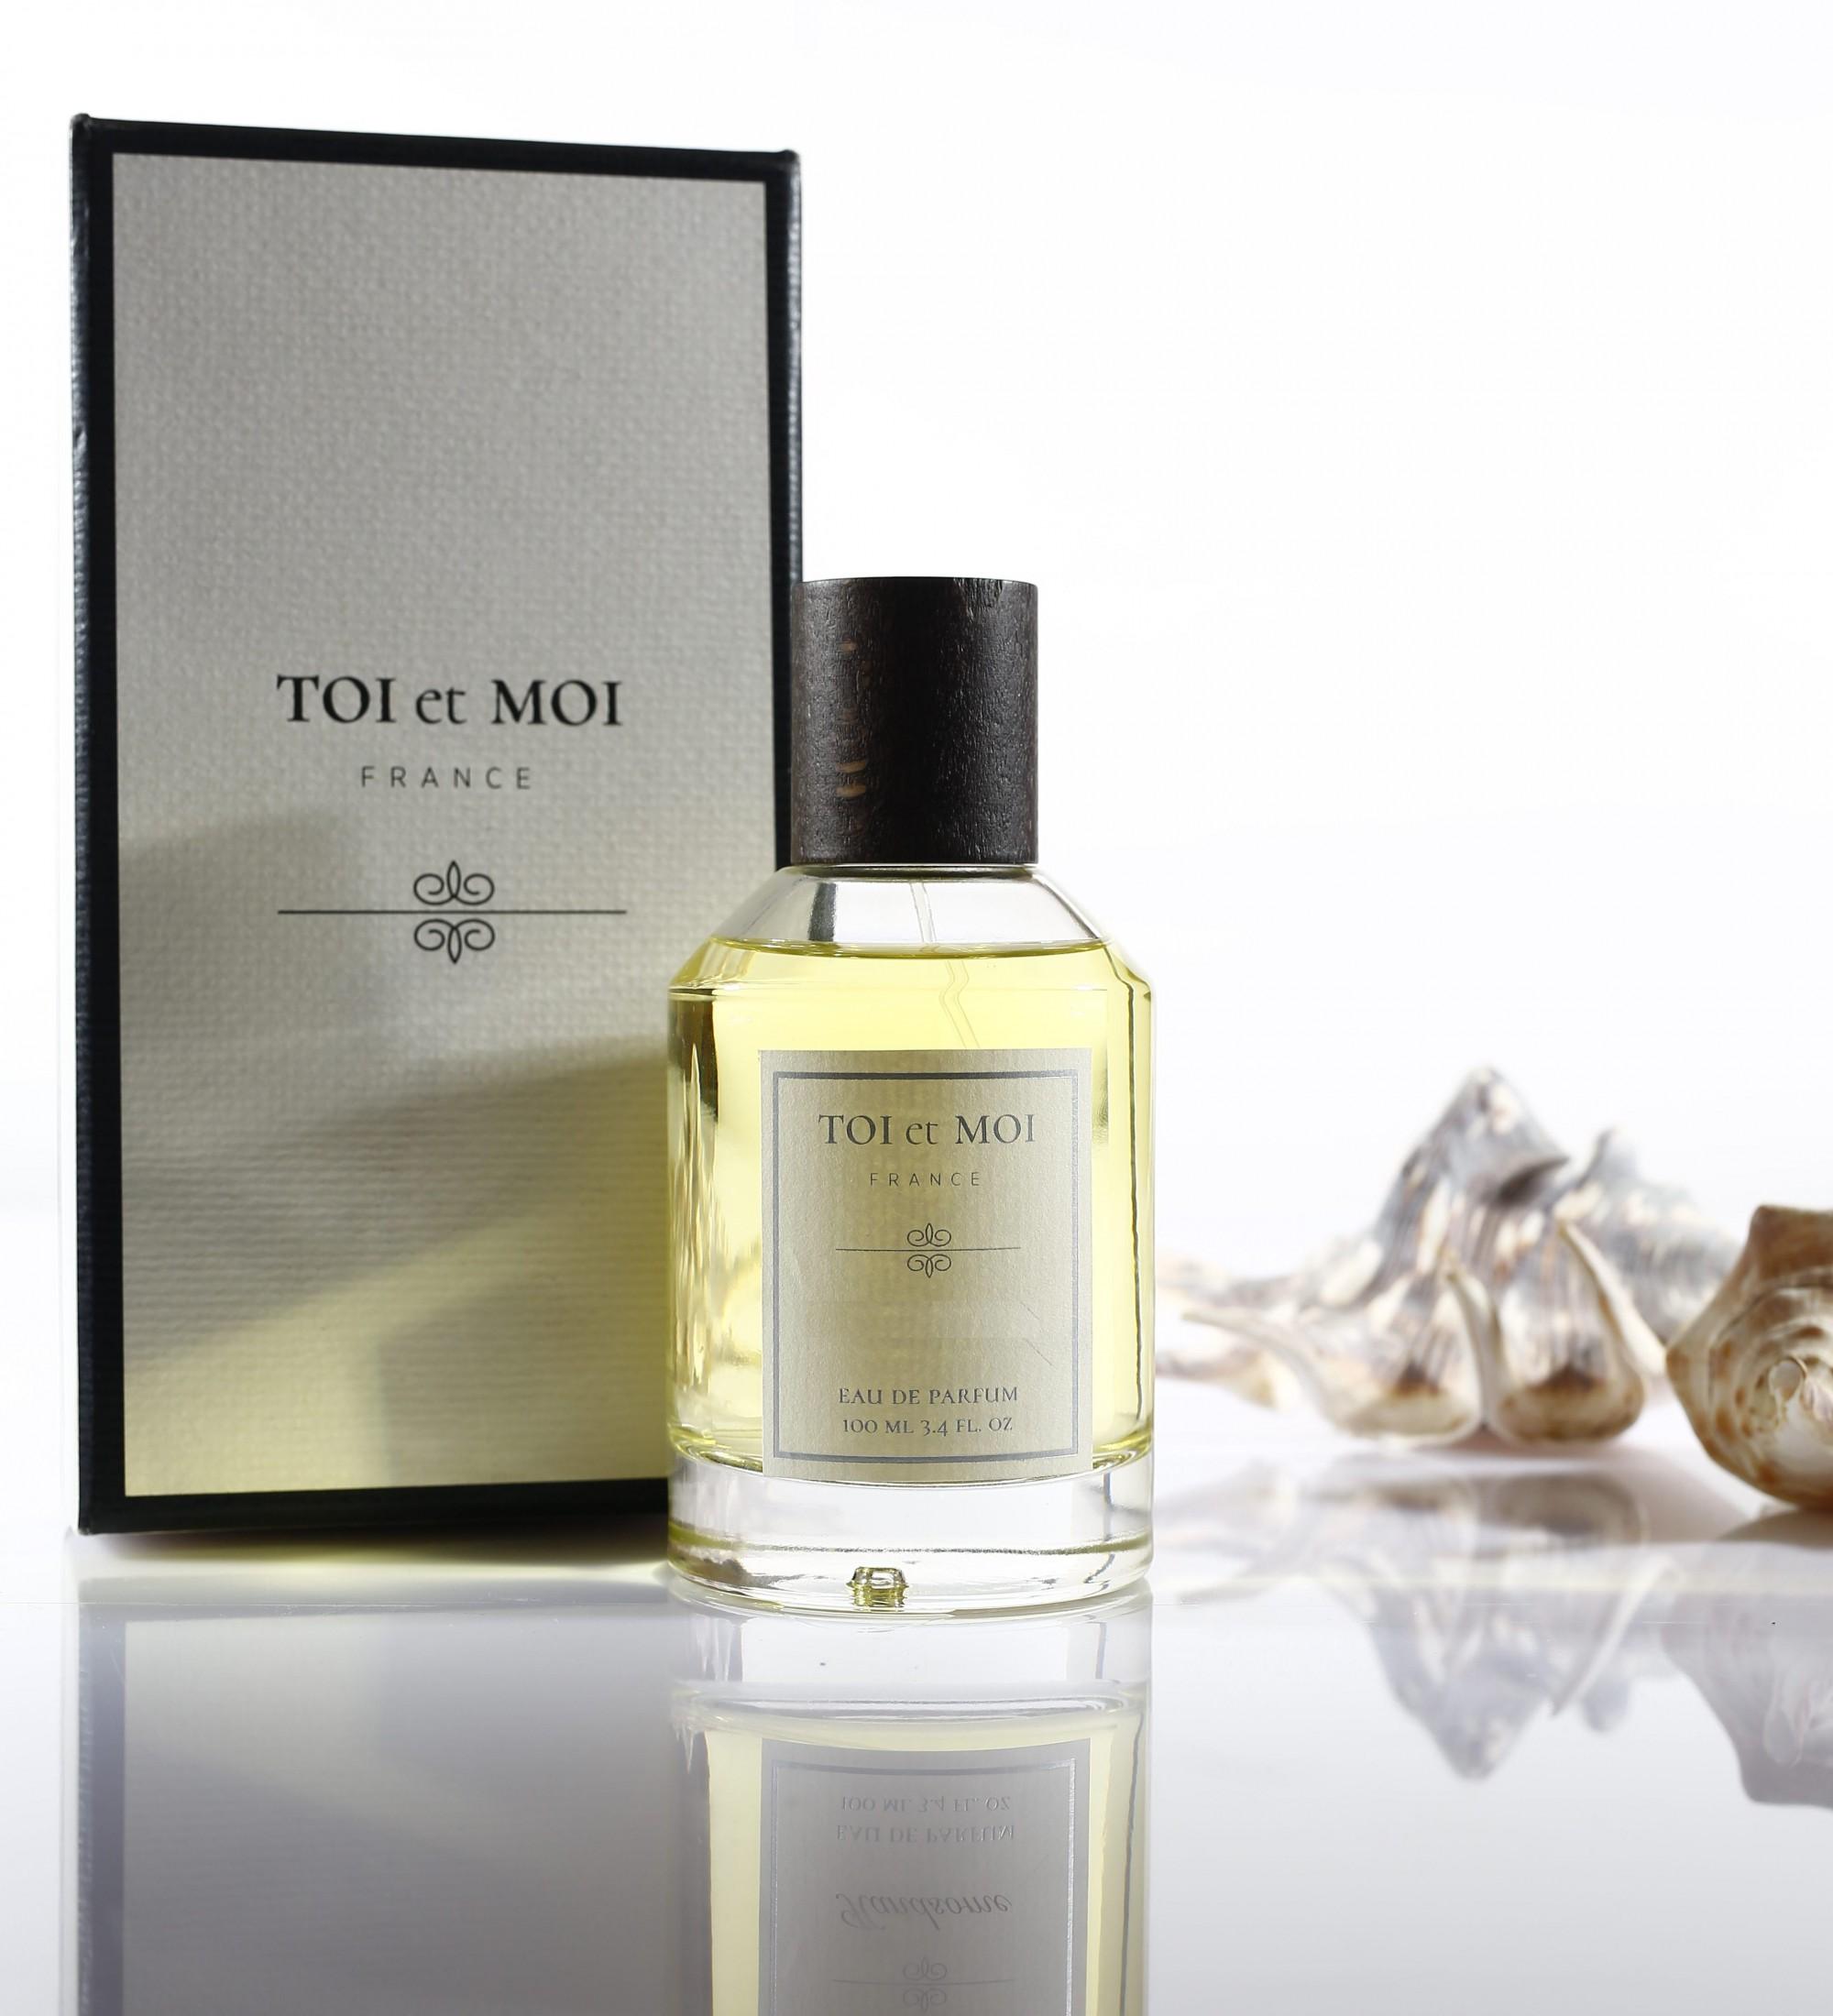 Toietmoi Galypso Eau De Parfume By Toietmoi Women Parfum For Women 100 ML 3.4 FL. OZ